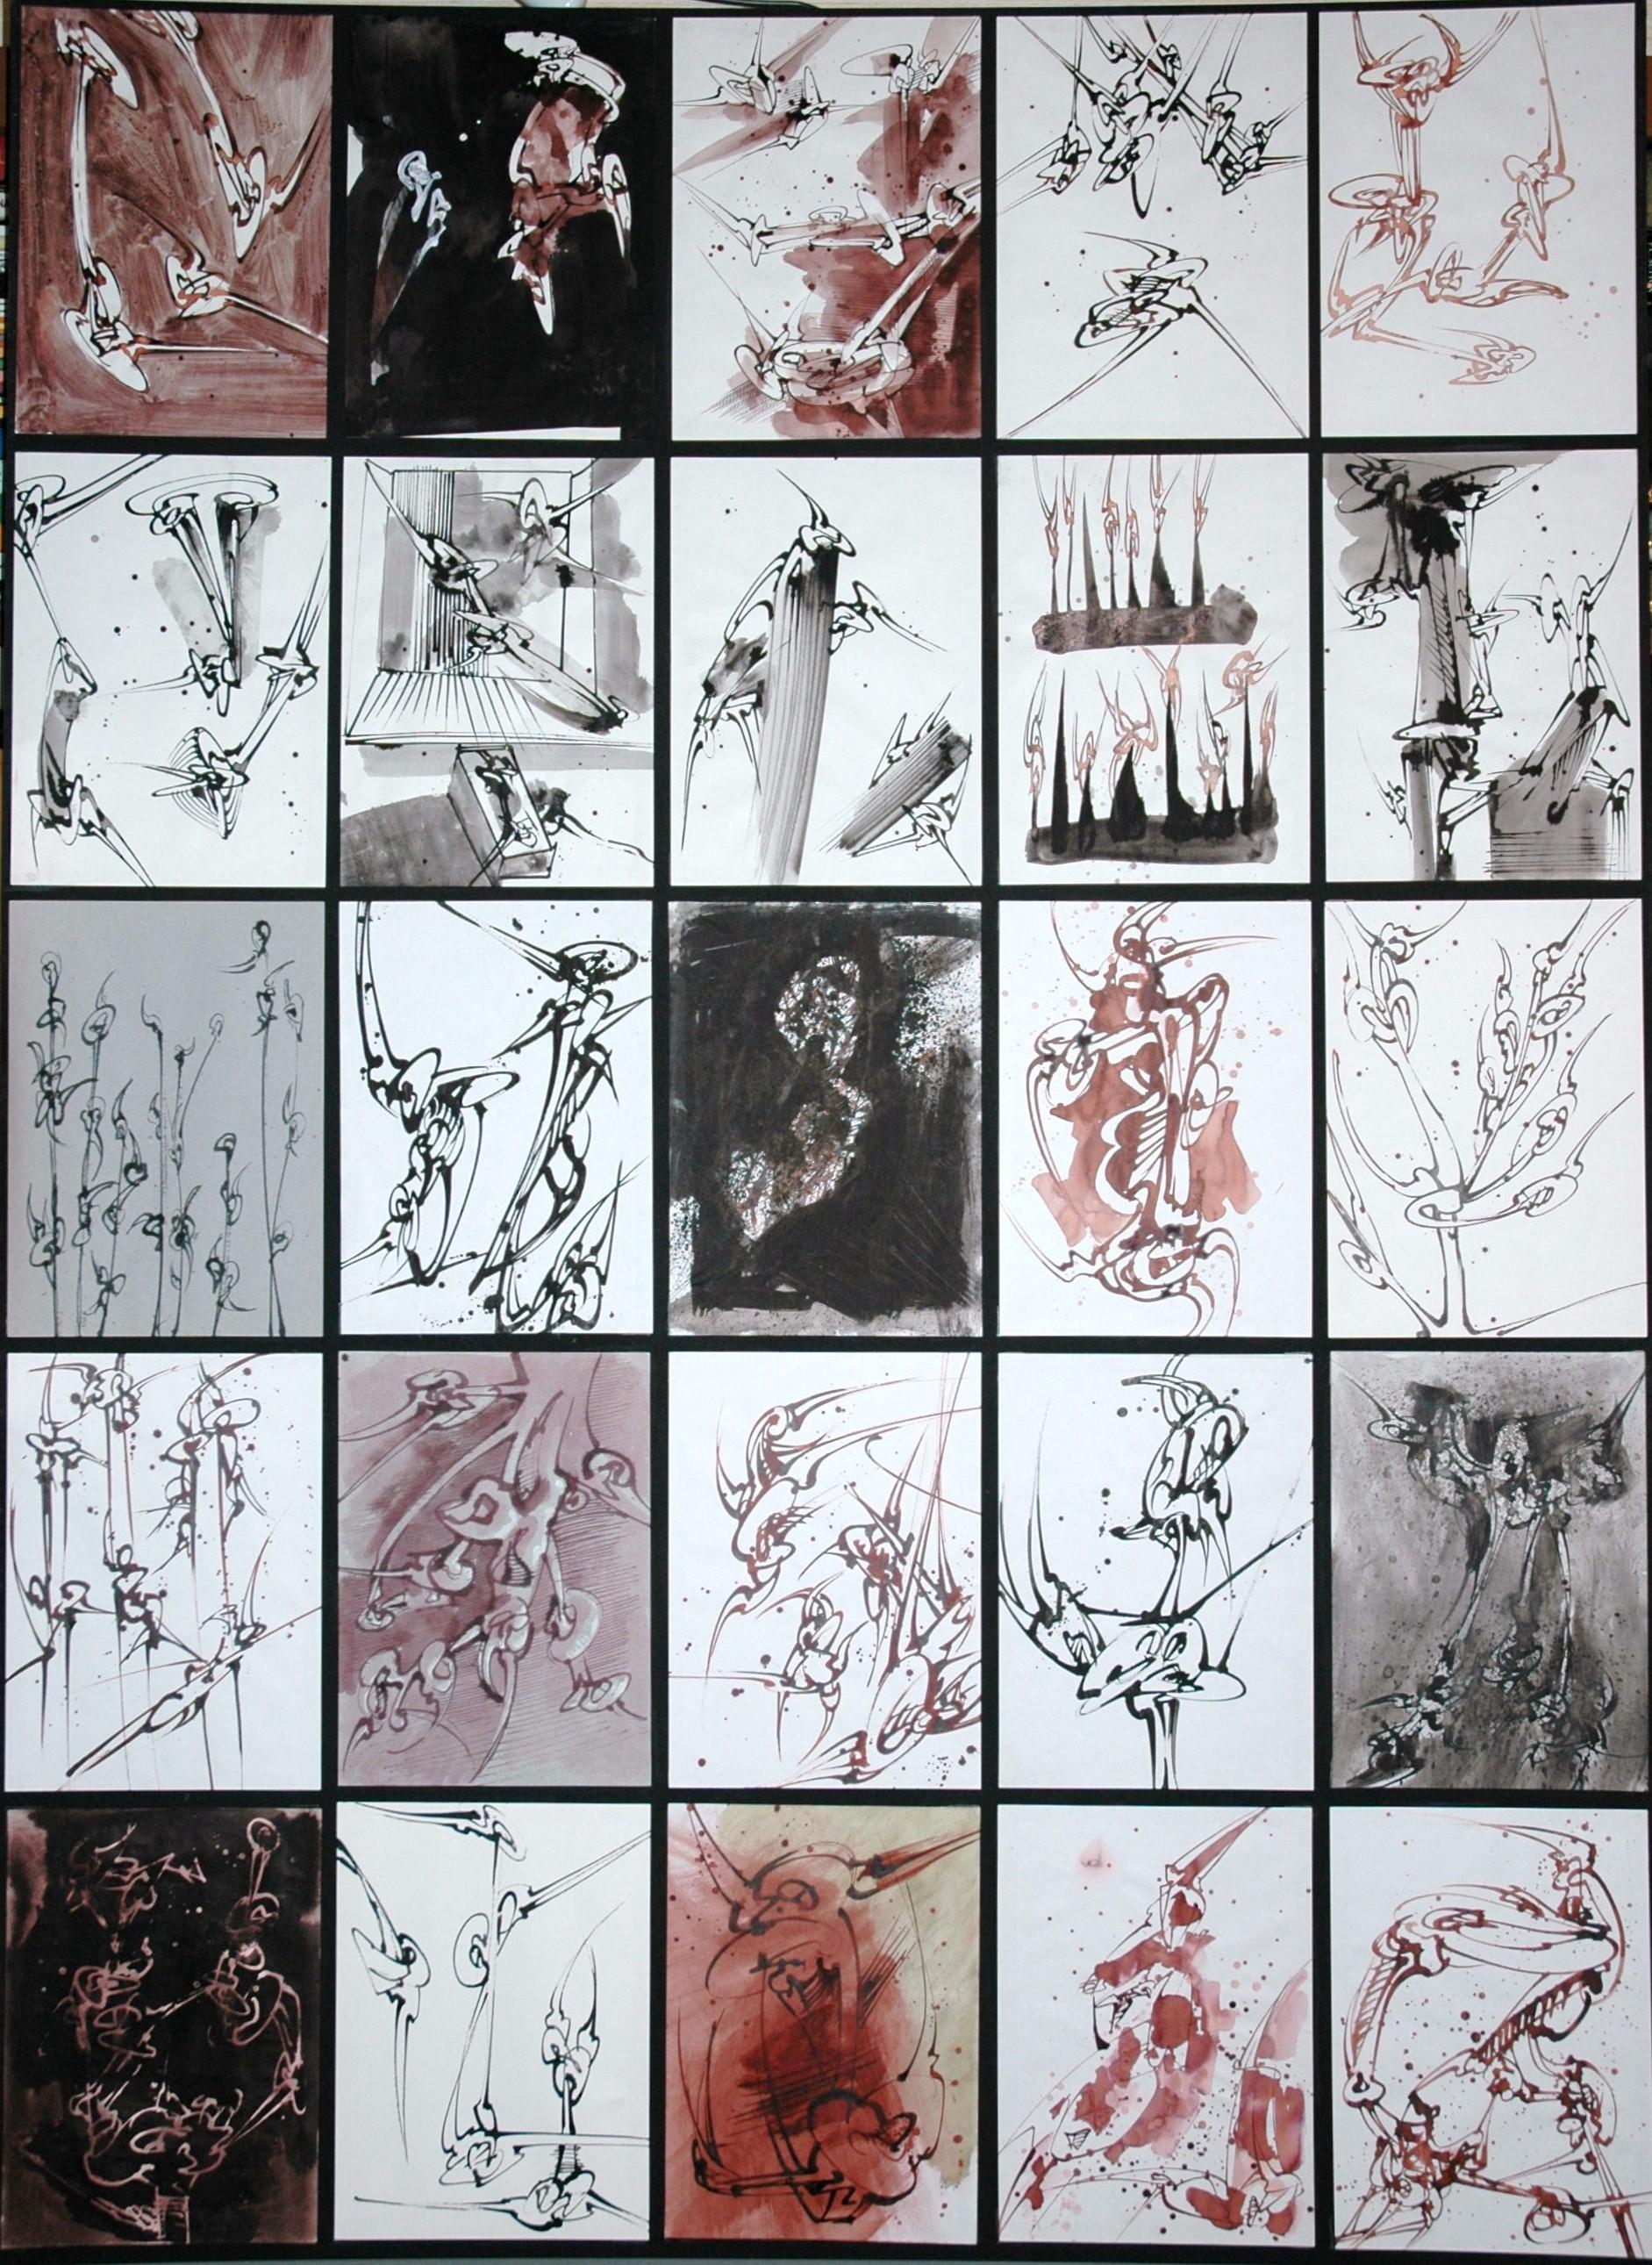 Black Box - 64 cartons (1600 dessins)